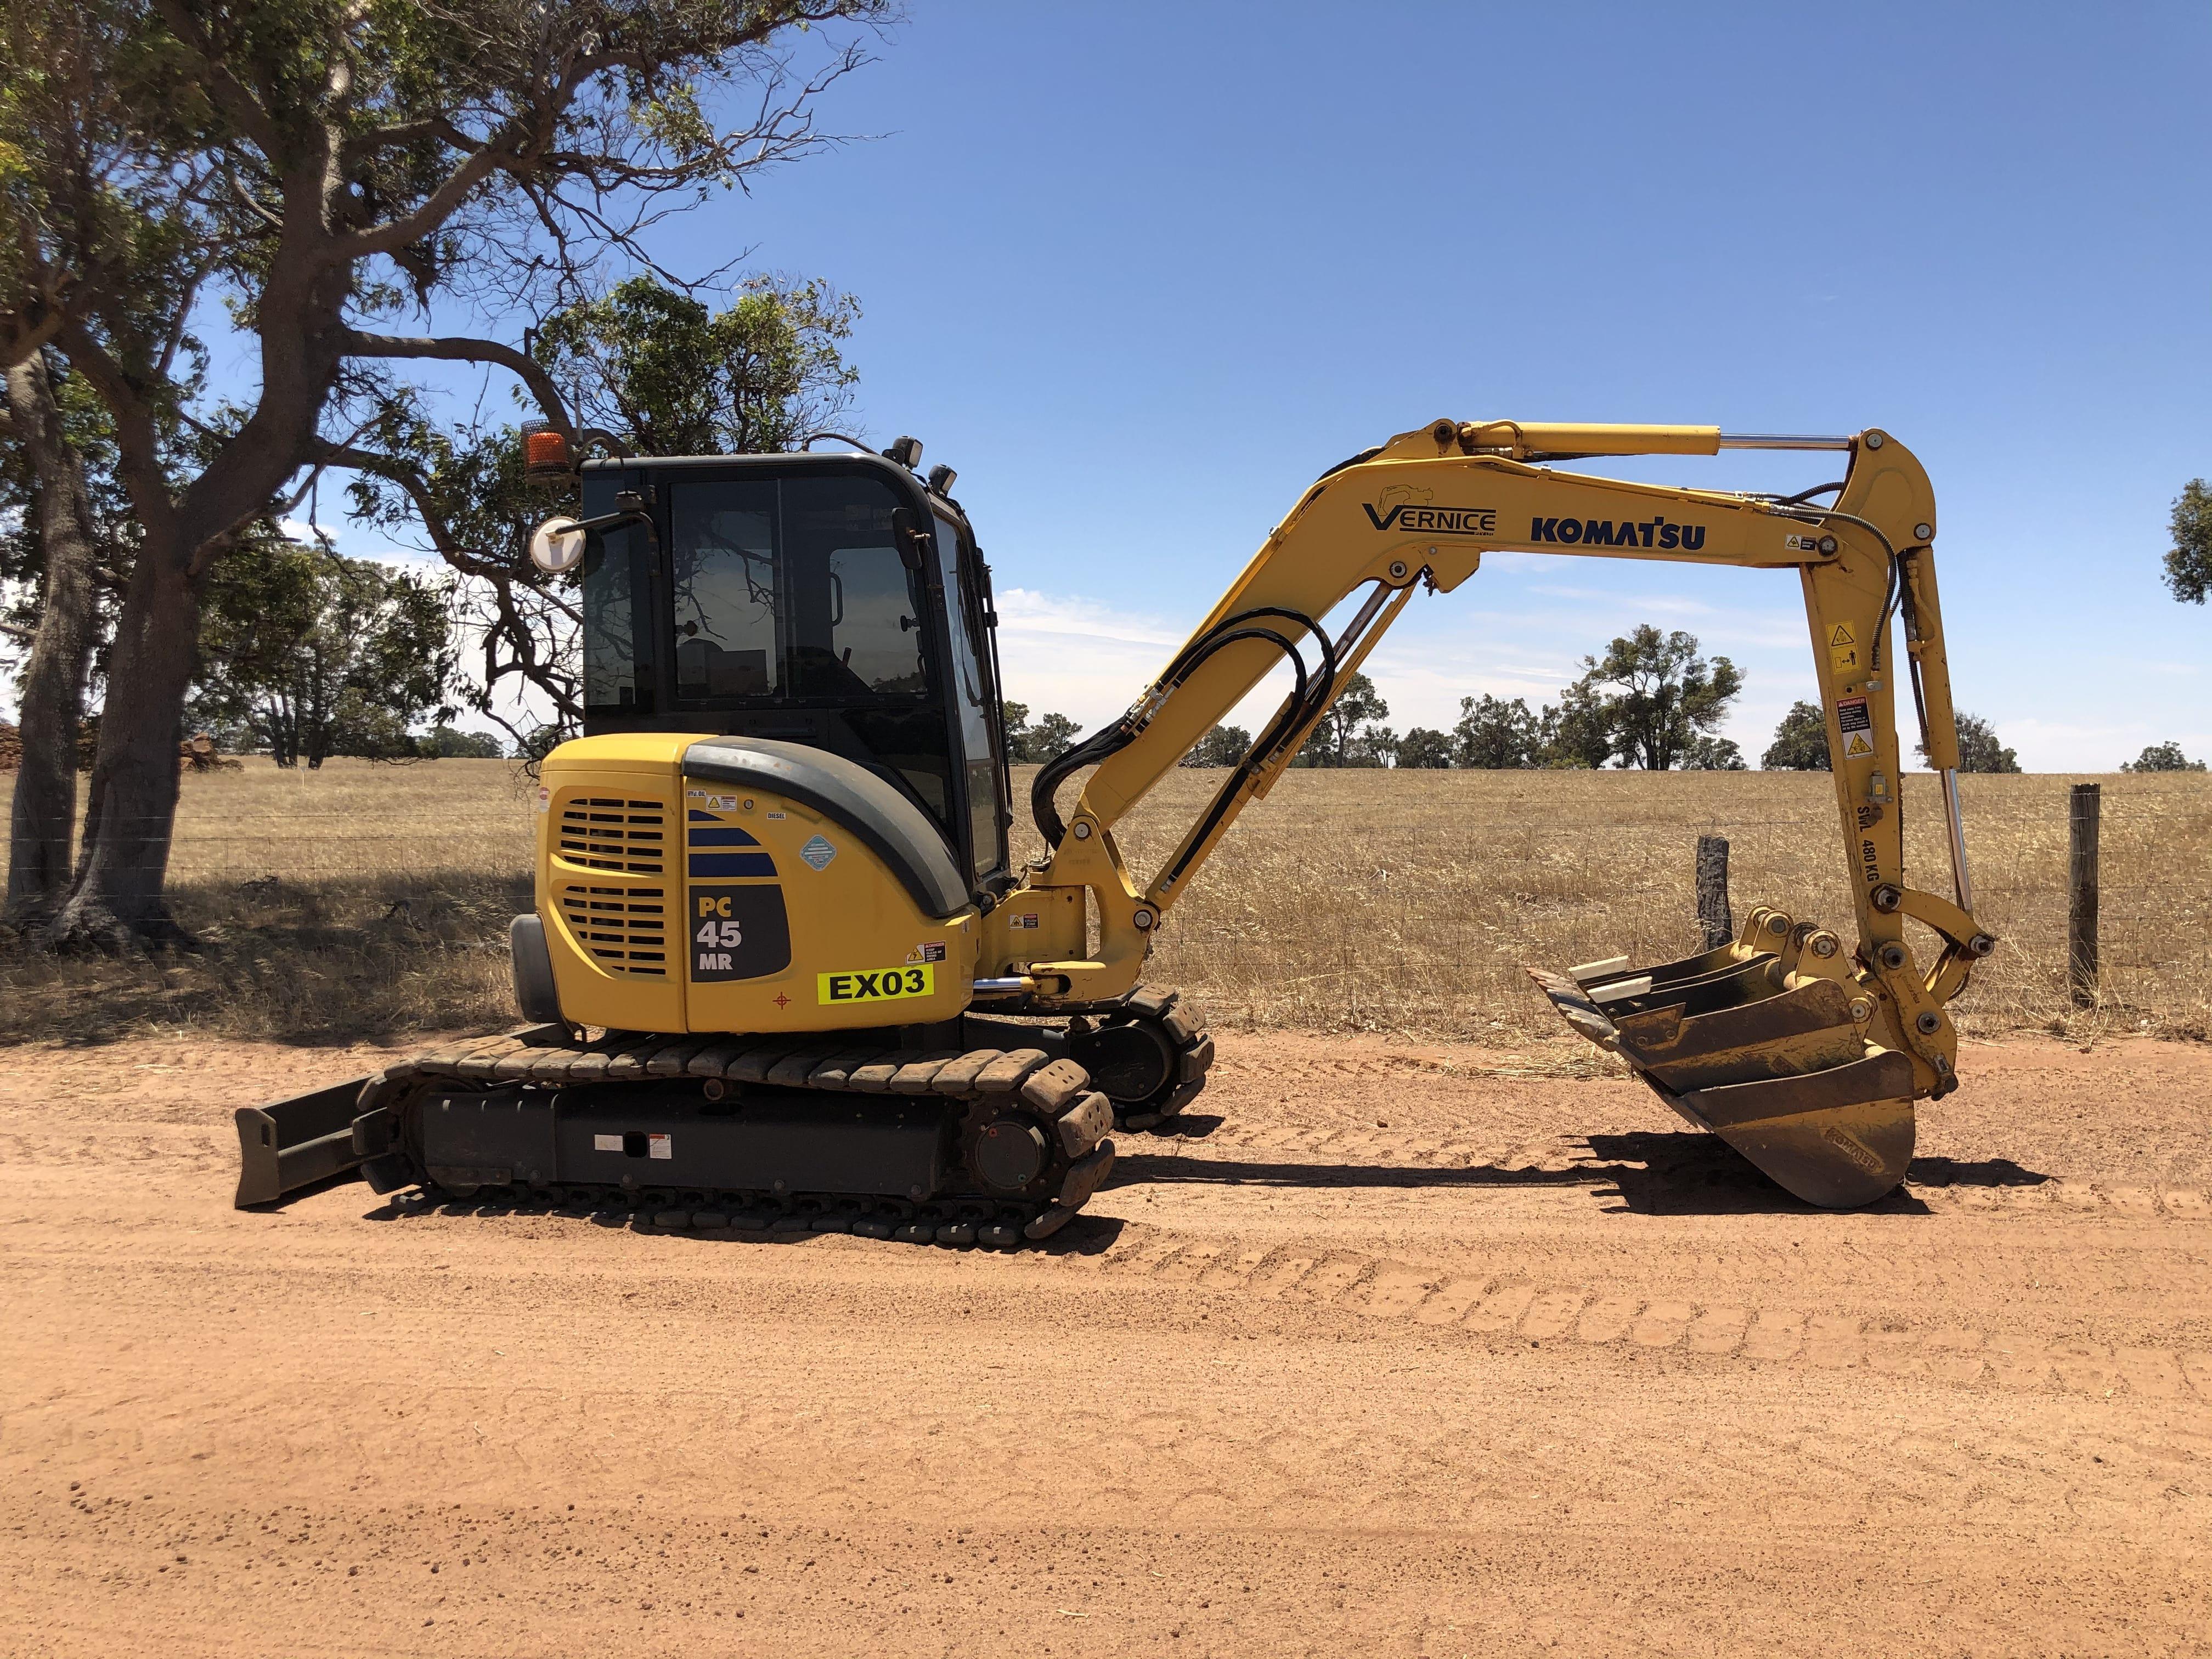 5 t excavator hire vernice western australia